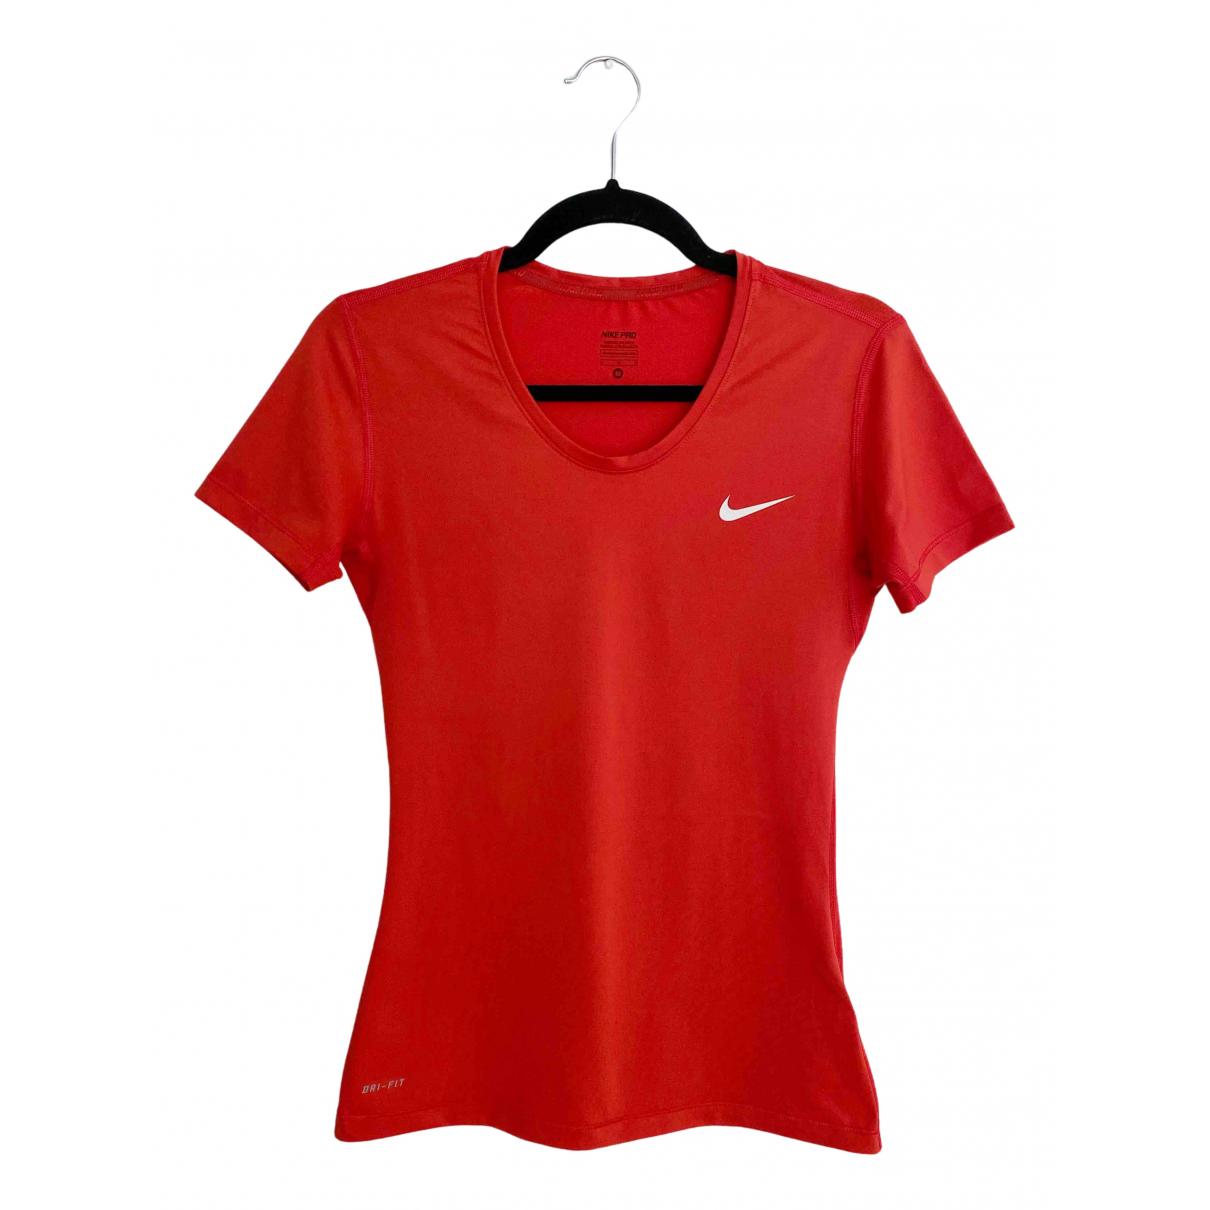 Nike - Top   pour femme - orange